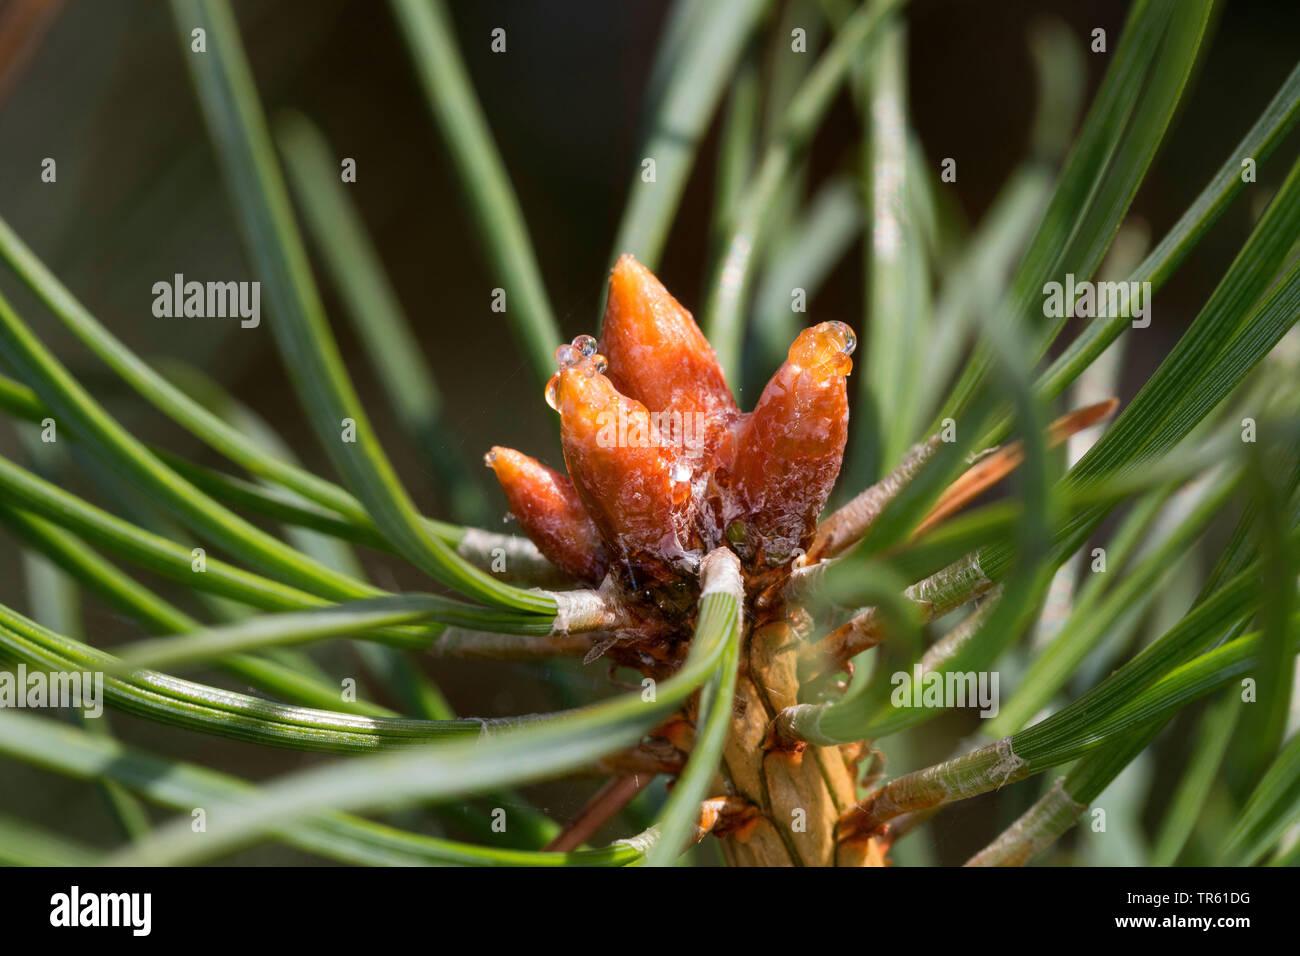 Scotch pine, Scots pine (Pinus sylvestris), liquid pitch on buds, Germany Stock Photo